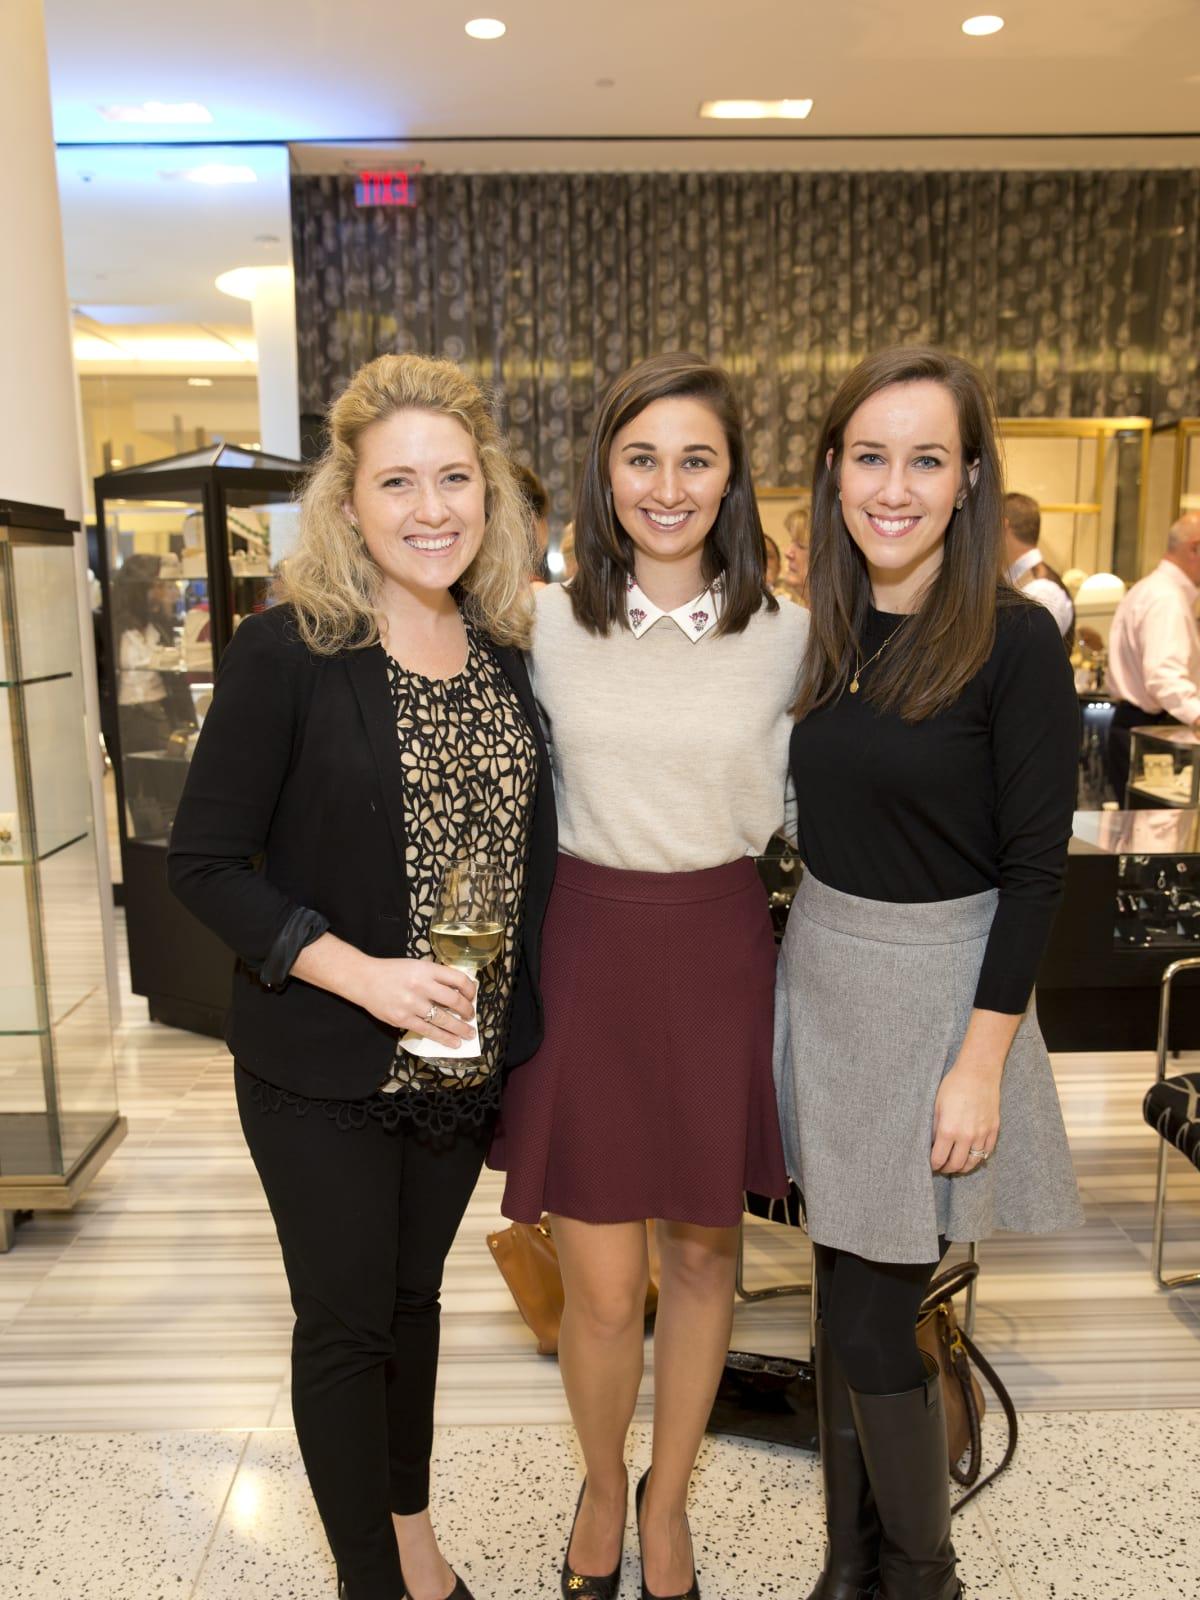 News, Tenenbaum at Tootsies, Dec. 2015, Fay Fitzsimons, Allyson Camp, Elise Swann